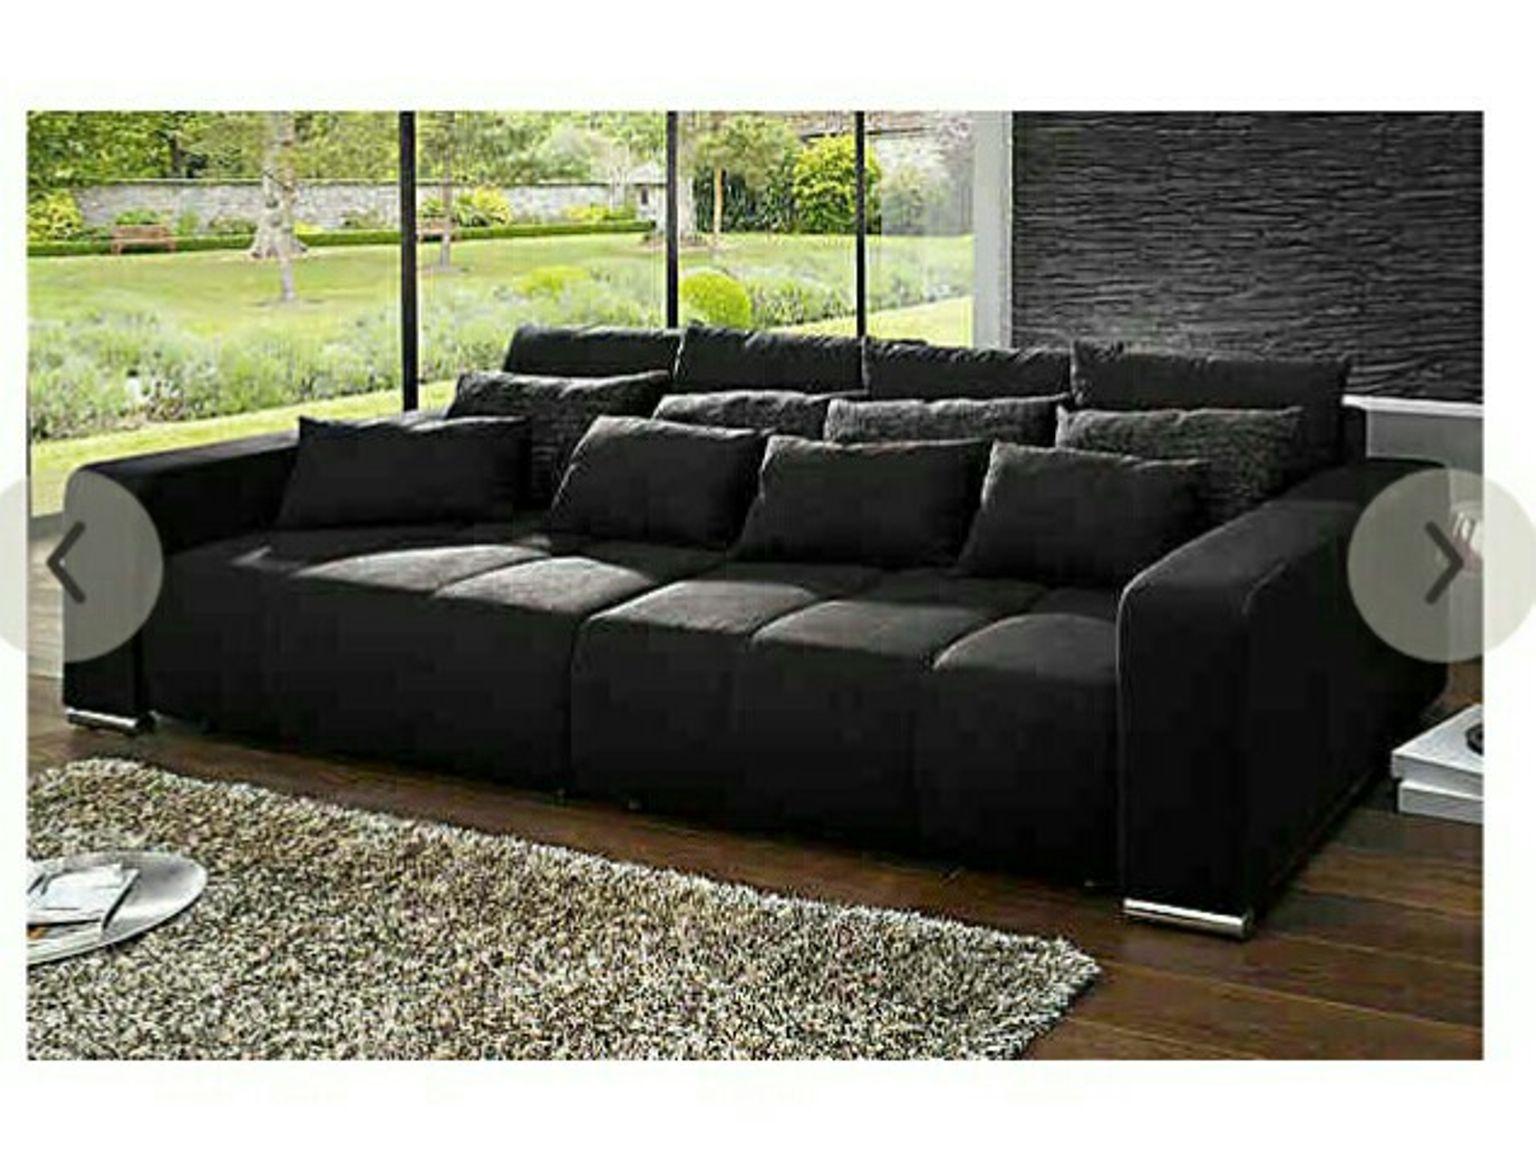 Billig Big Sofa Xxl Deutsche In 2019 Big Sofas Sofa Big Couch